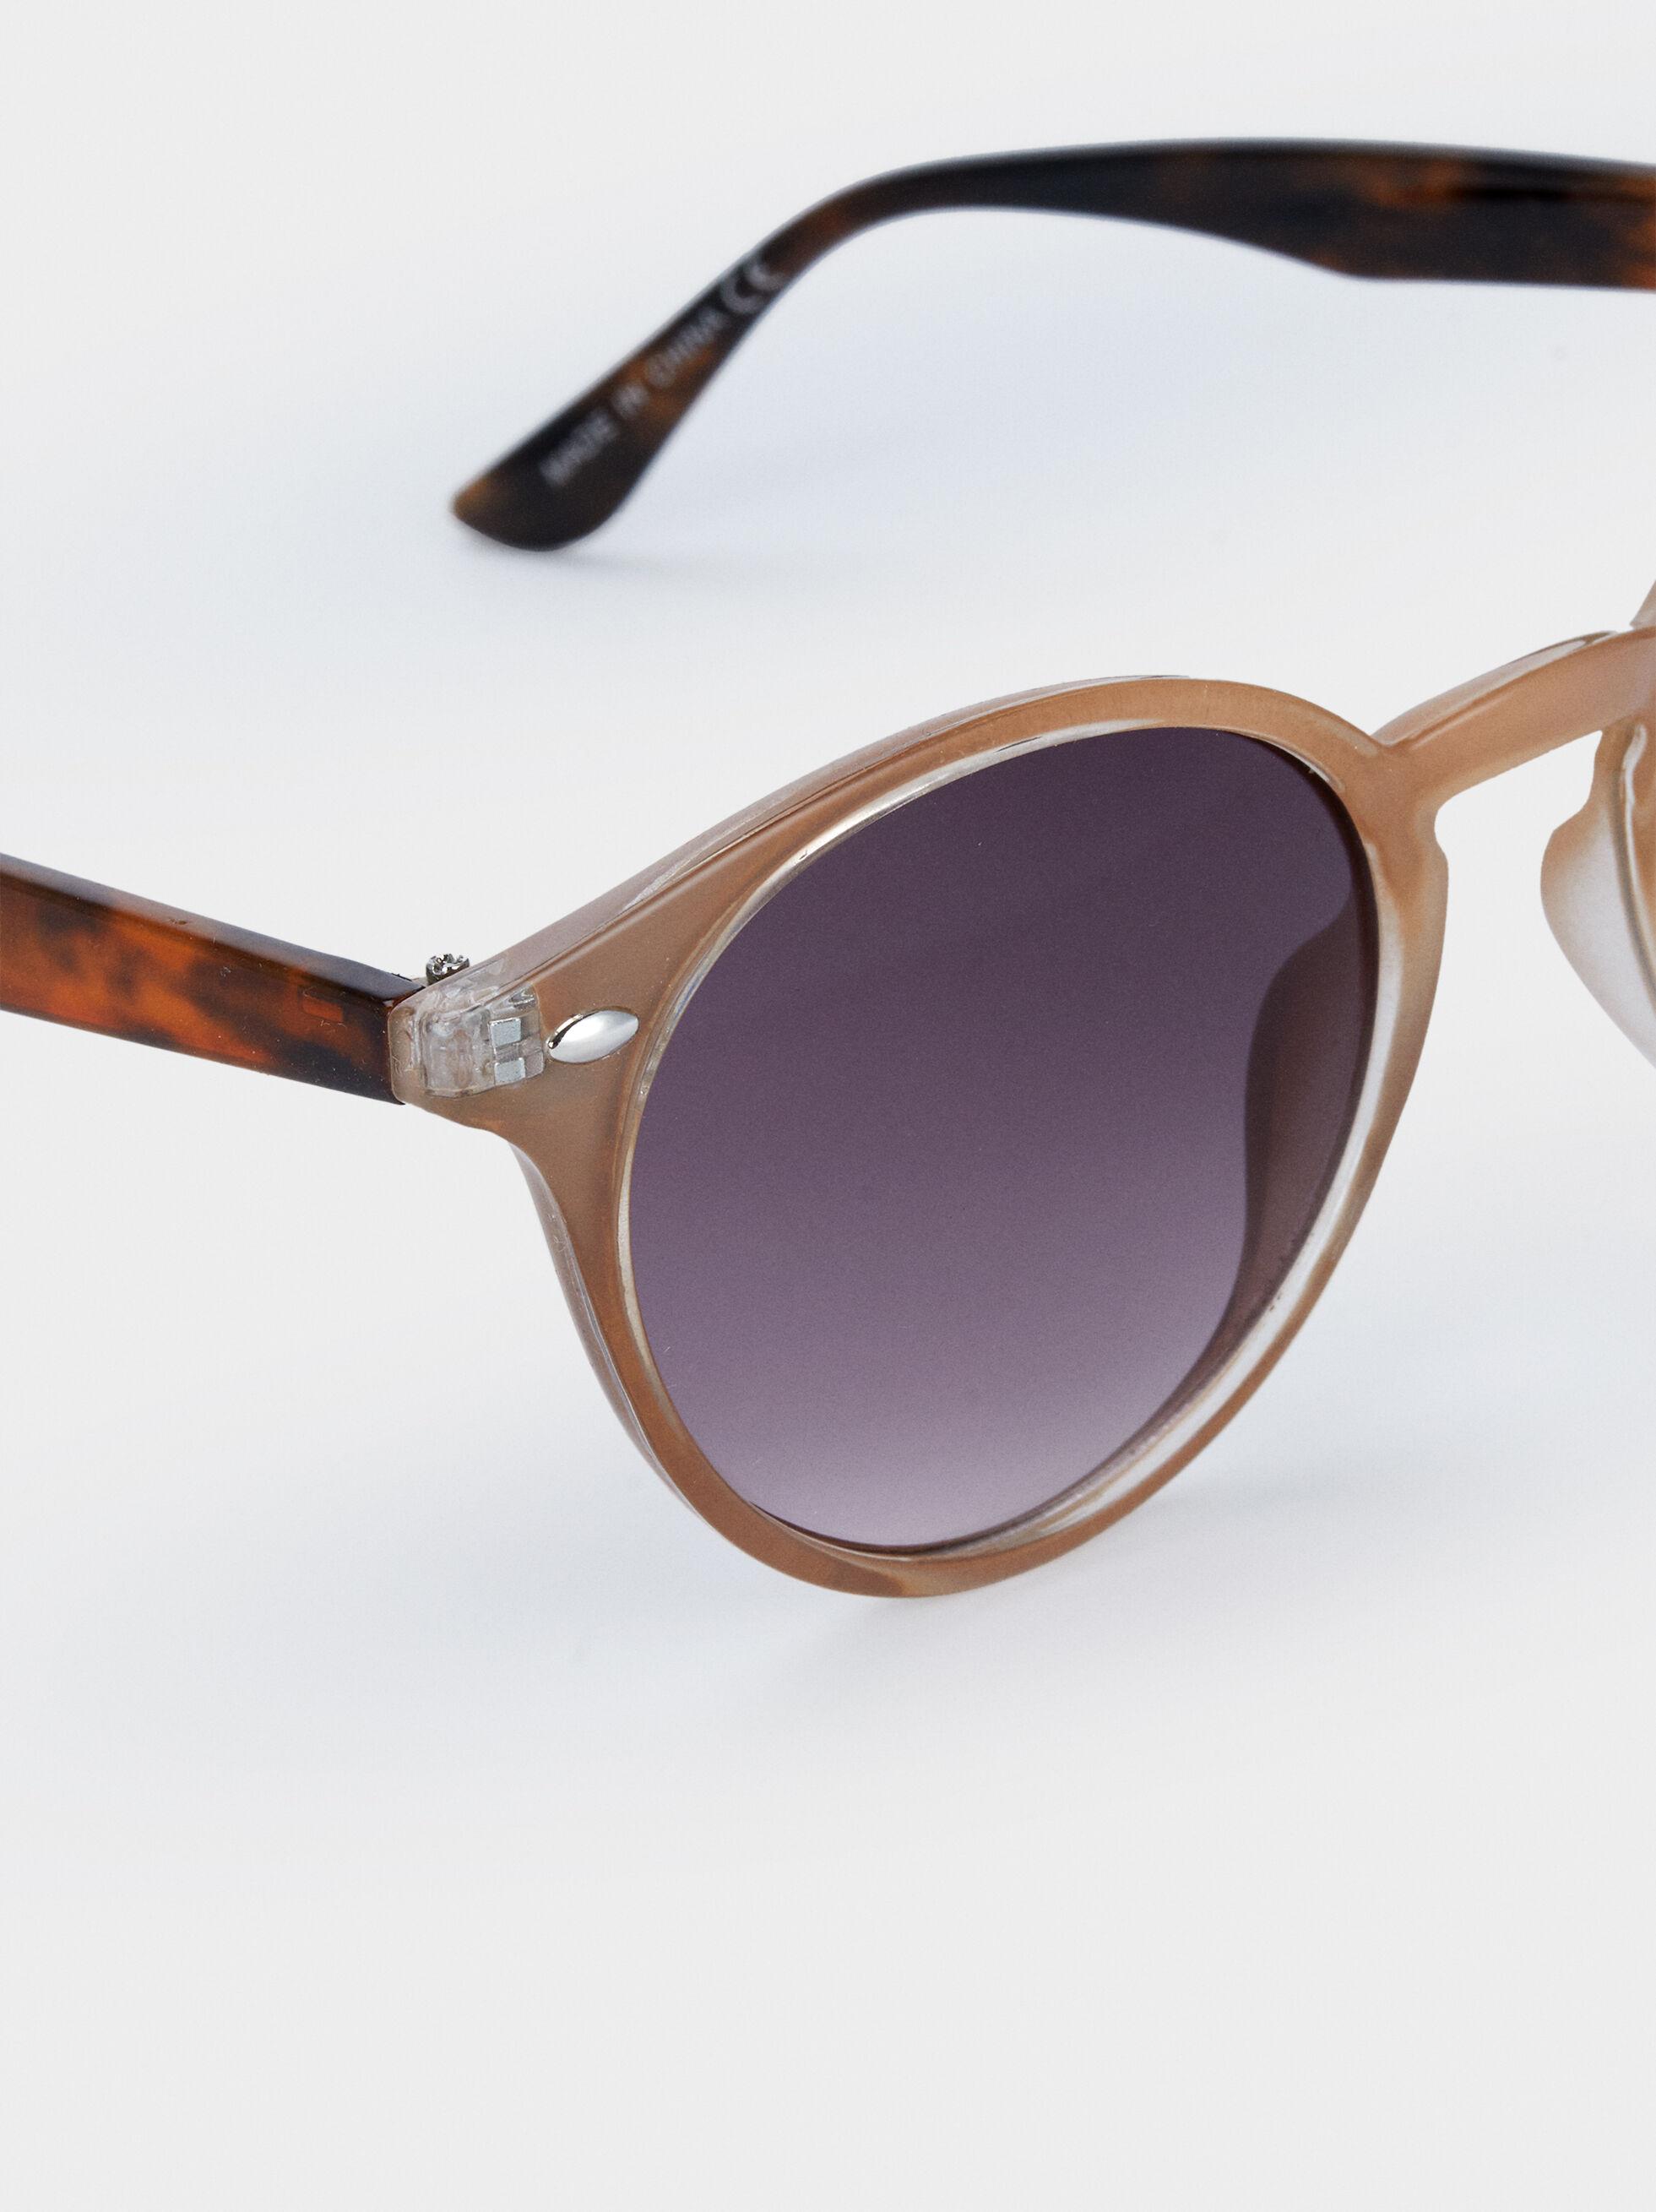 Round Frame Plastic Sunglasses, Brown, hi-res